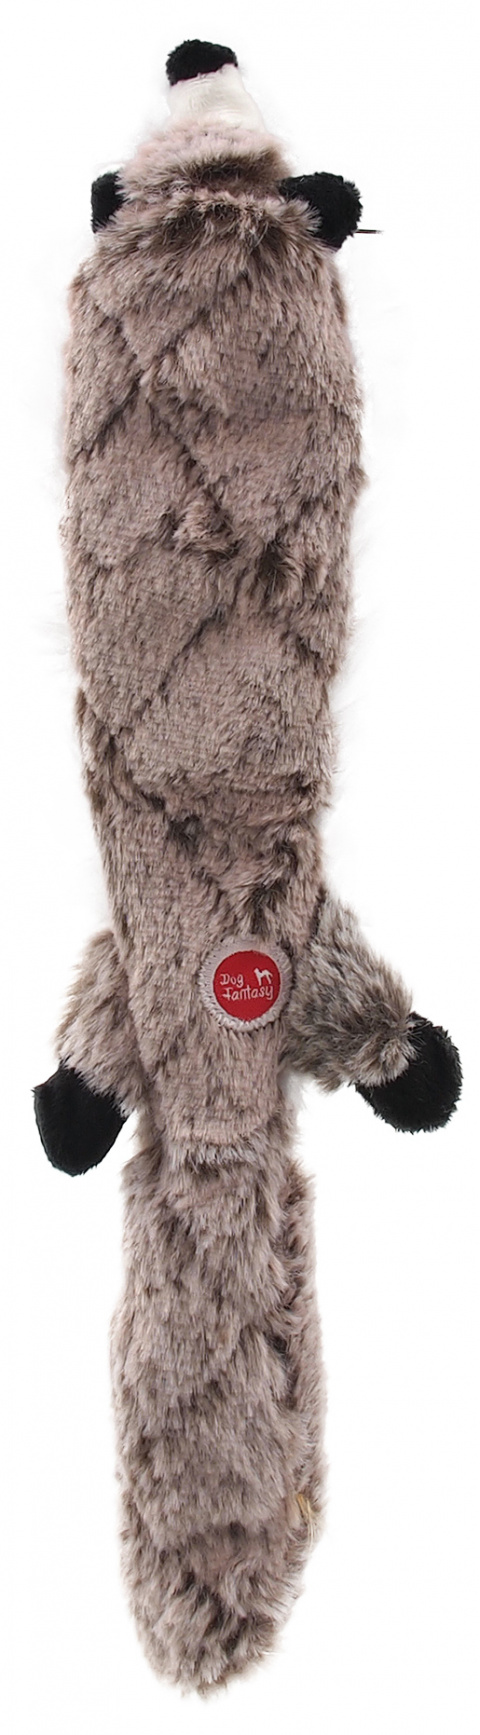 Hračka Dog Fantasy Skinneeez EXTREME mýval 35cm